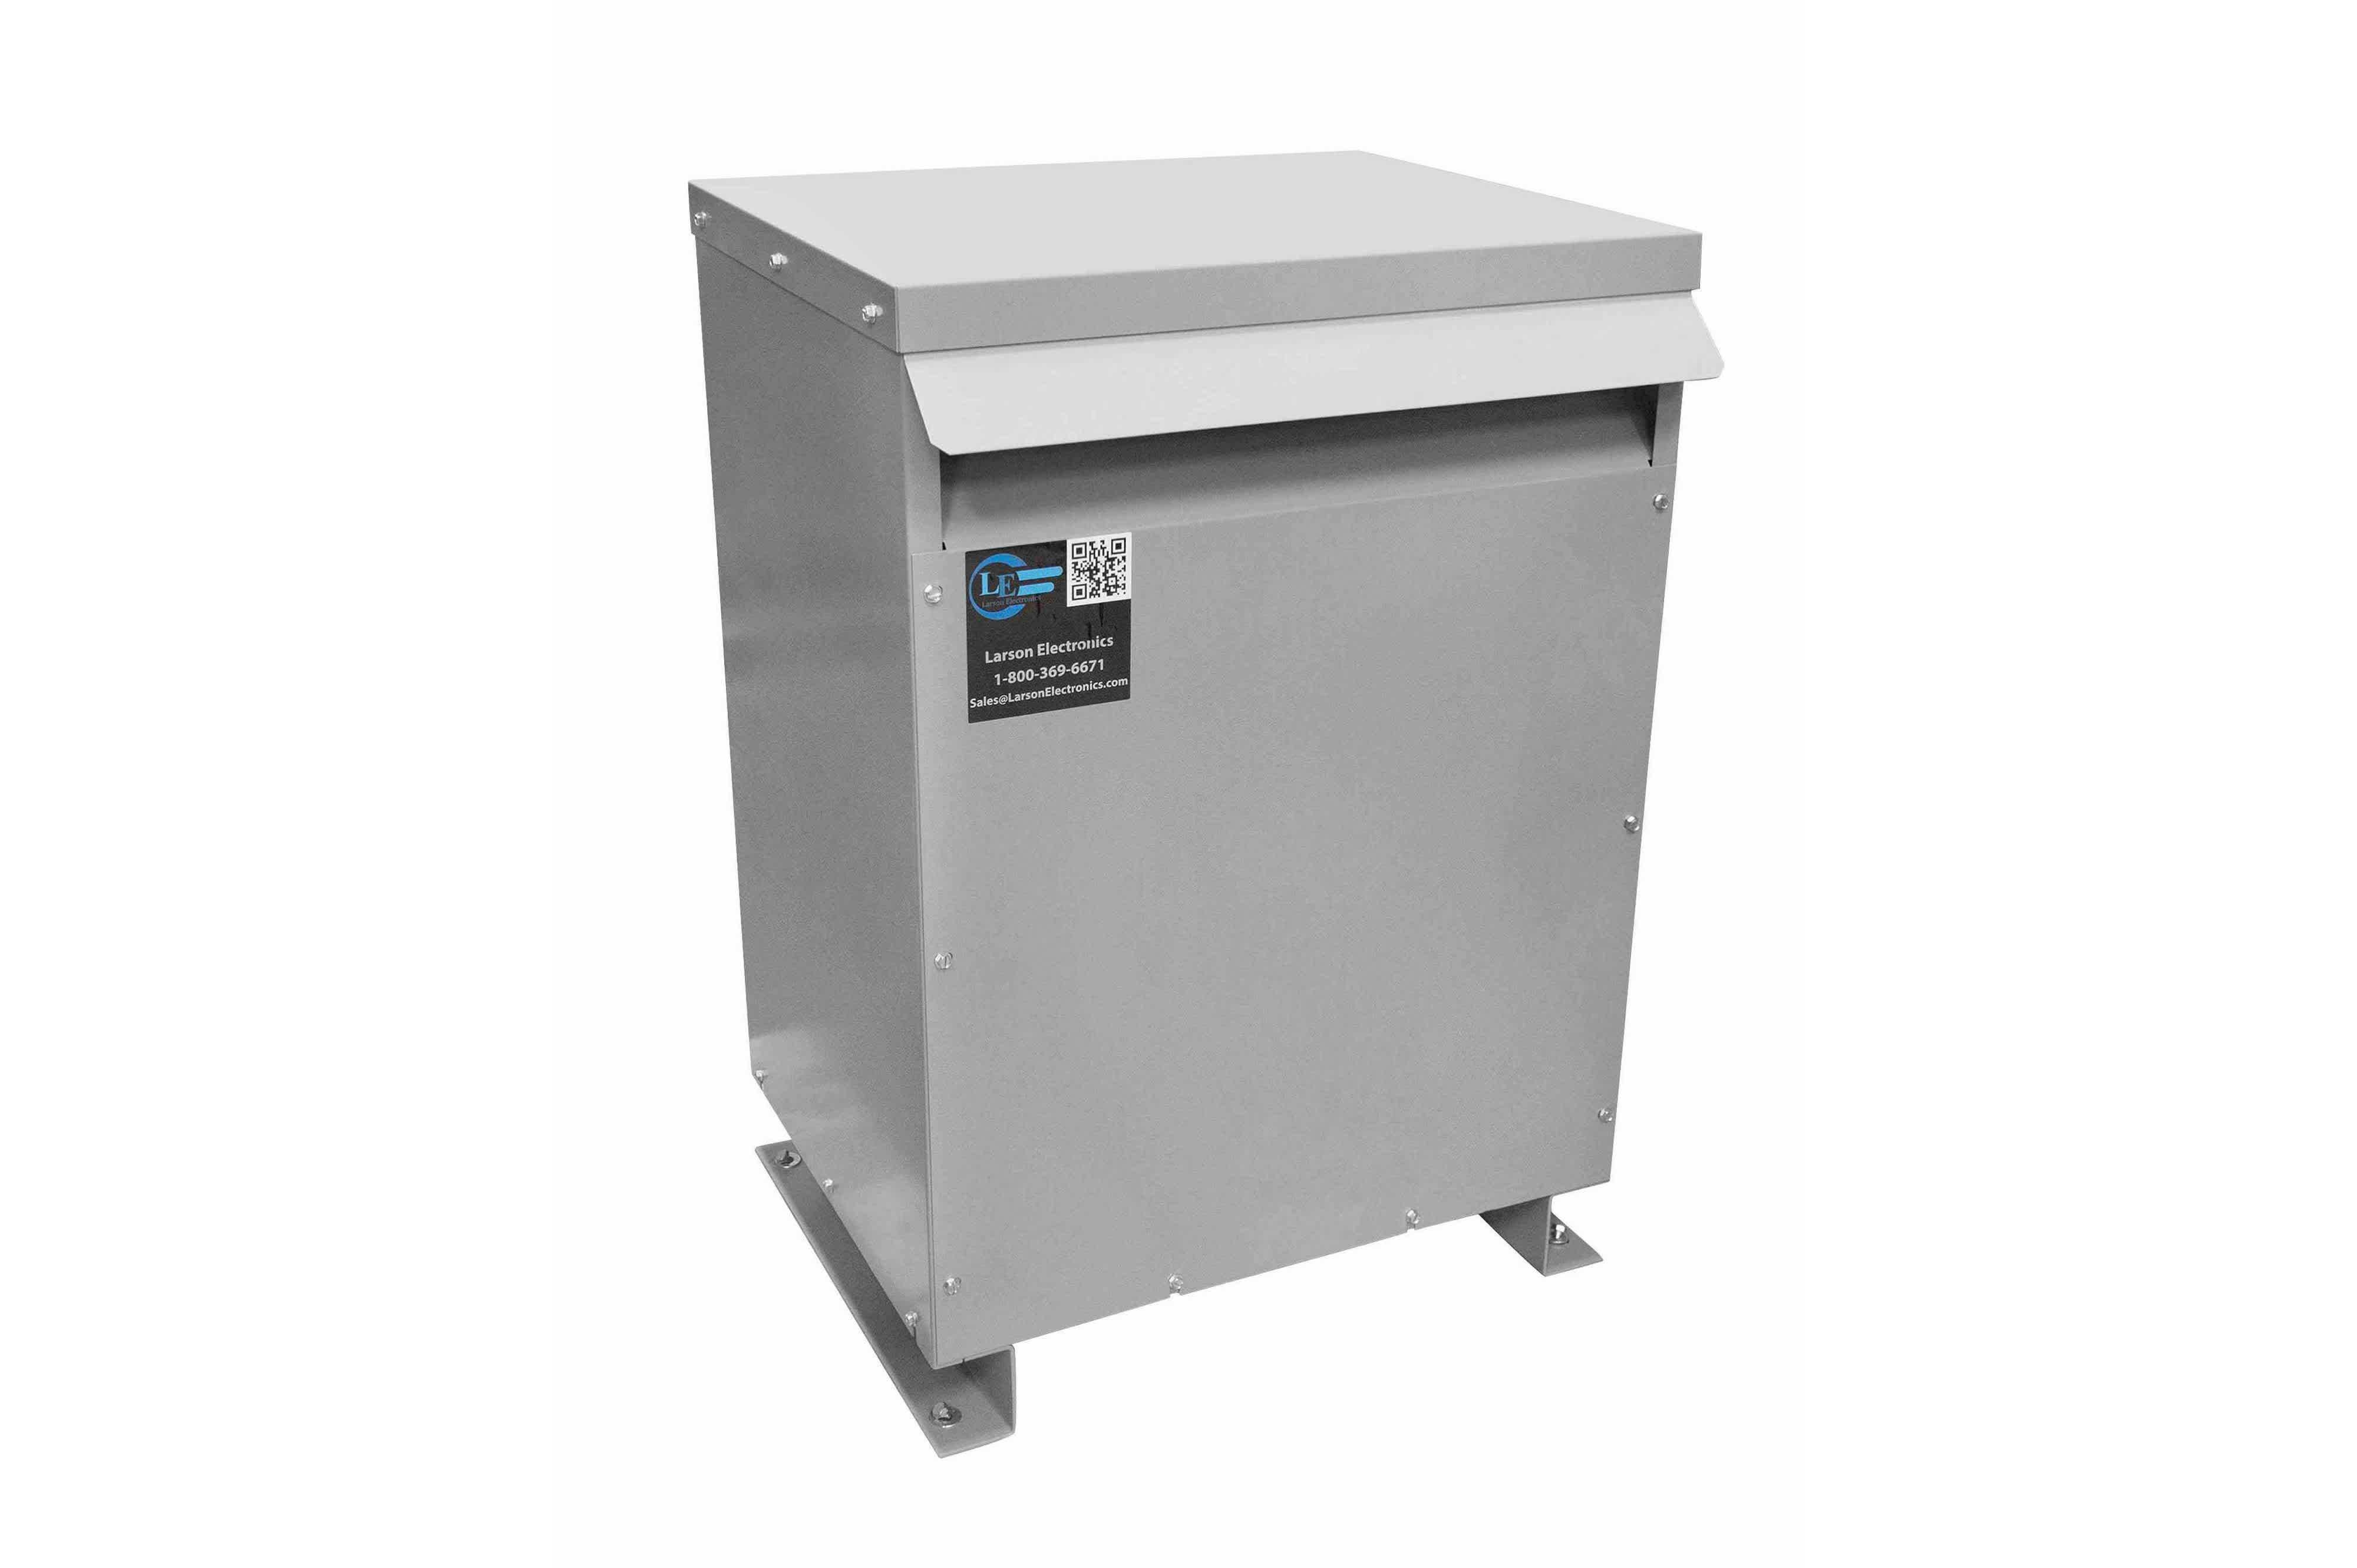 150 kVA 3PH Isolation Transformer, 440V Wye Primary, 240V Delta Secondary, N3R, Ventilated, 60 Hz